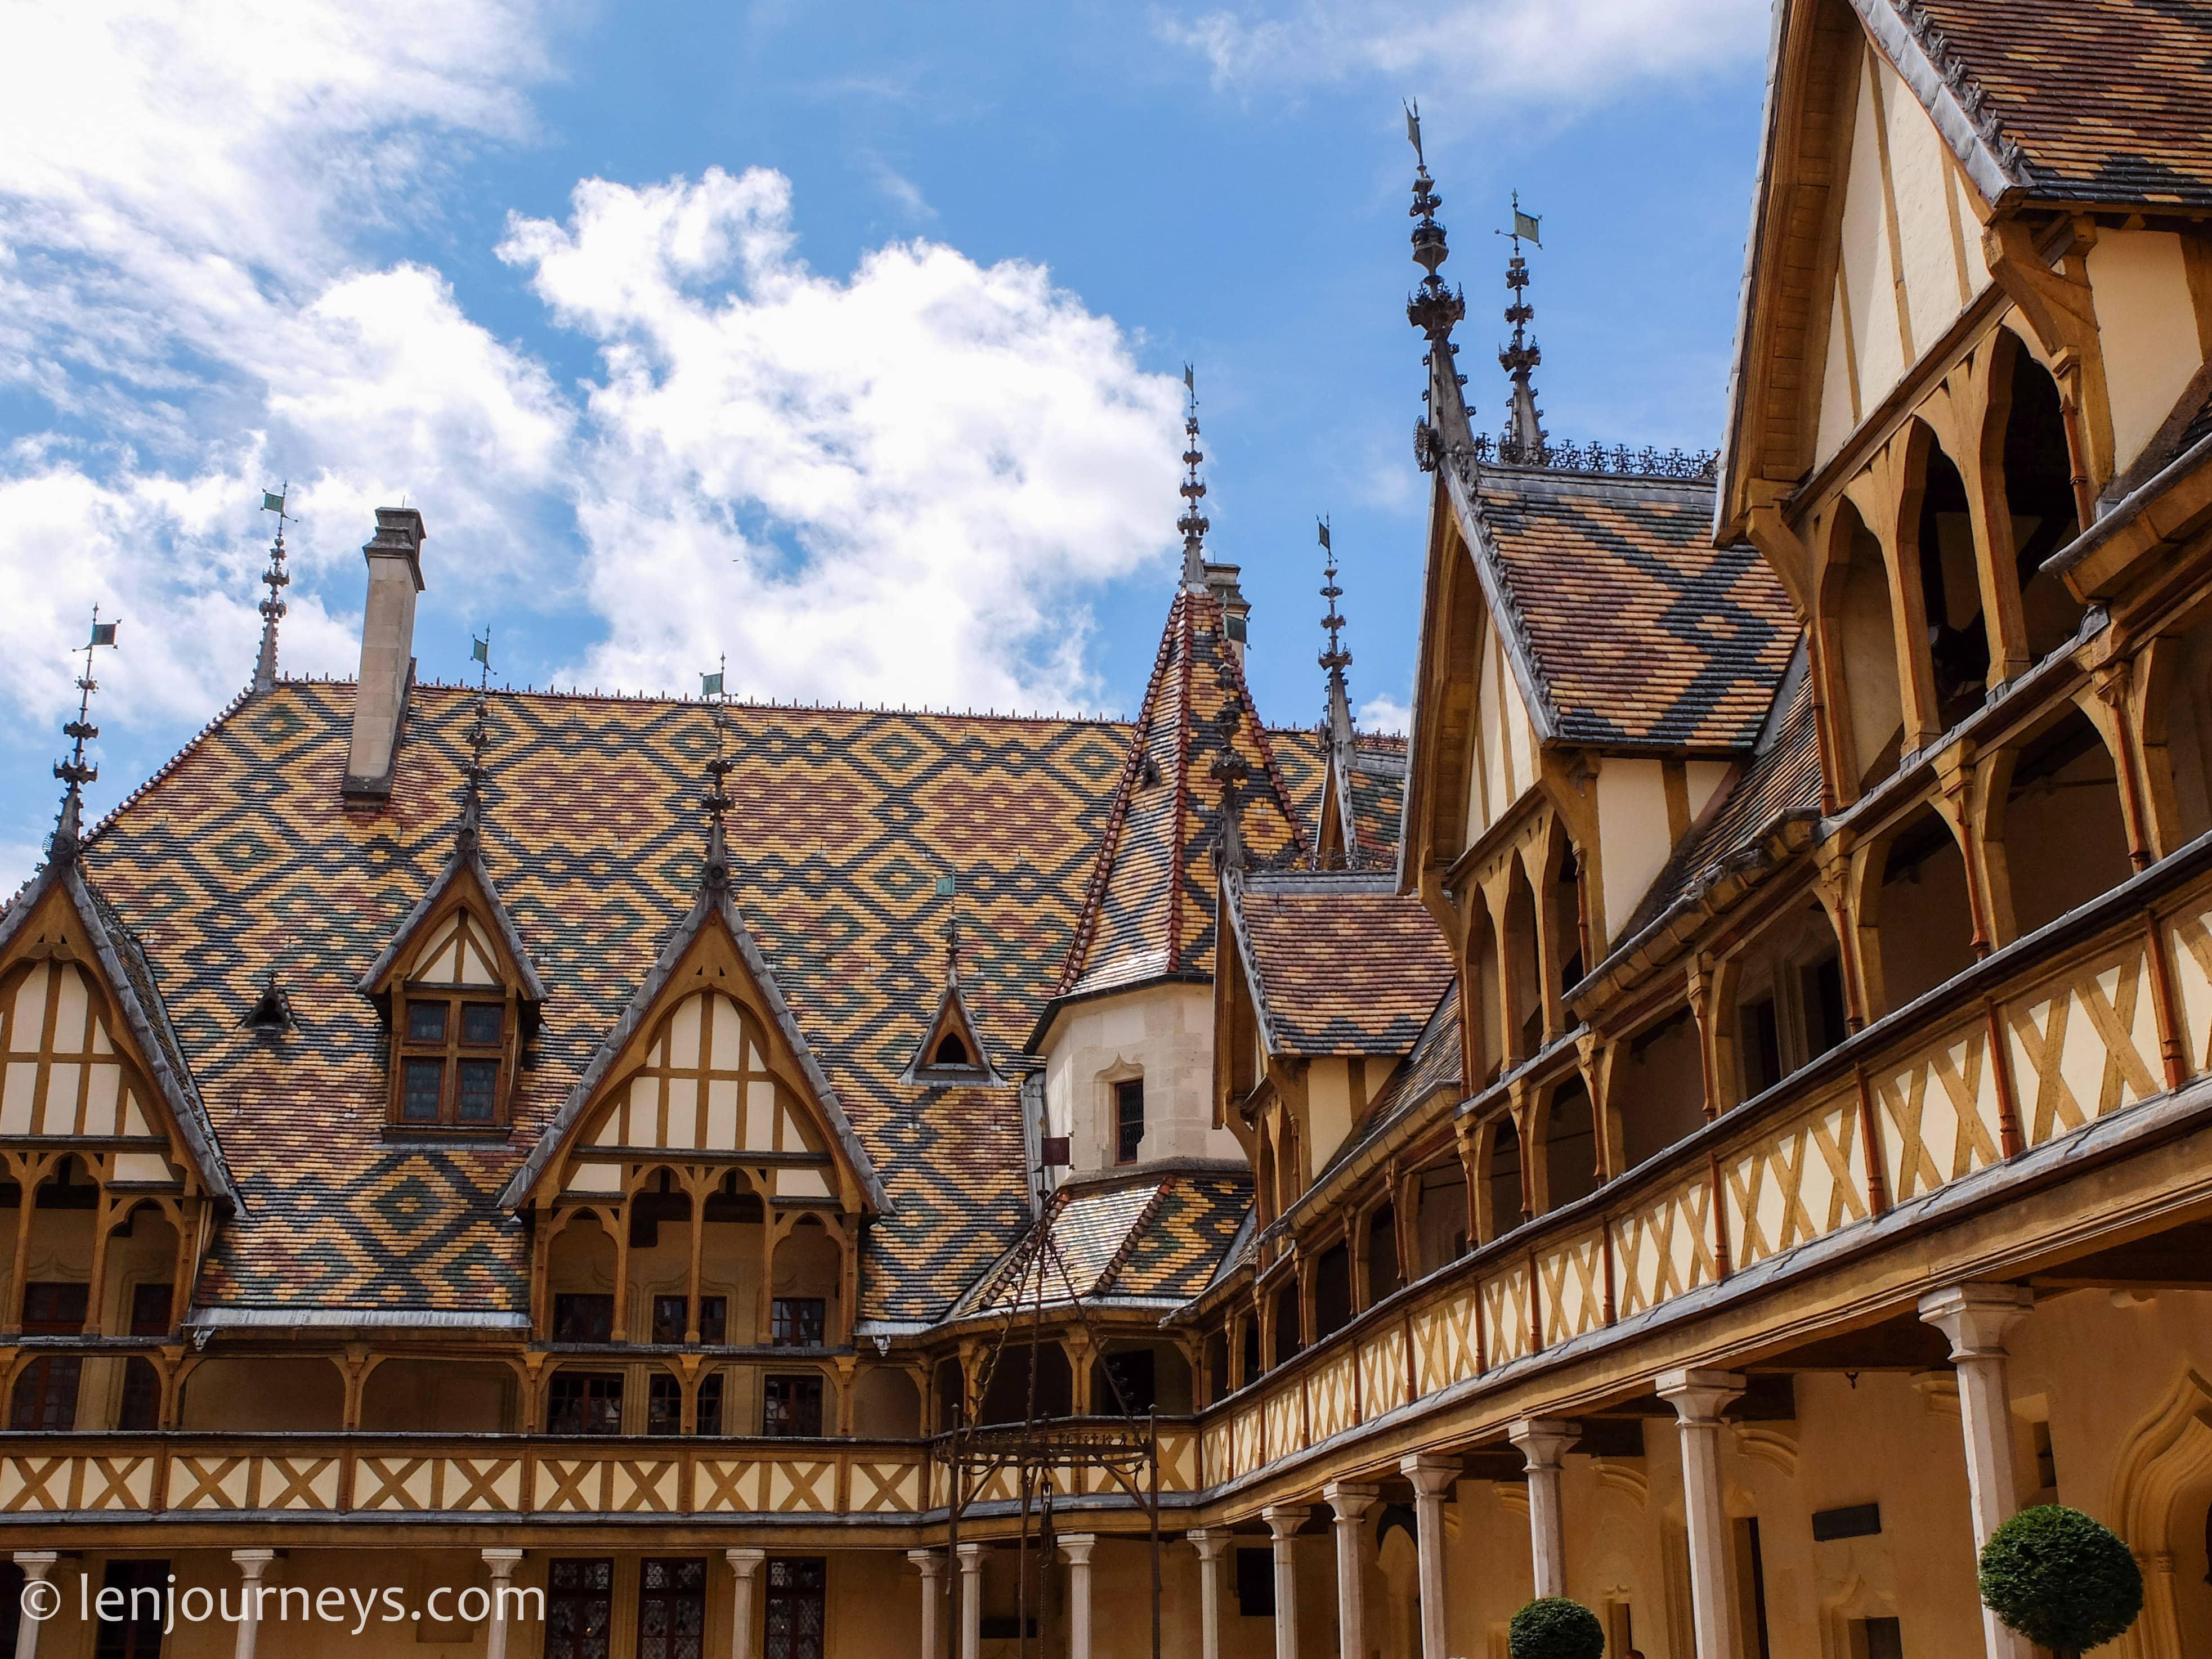 Hospices de Beaune, Burgundy